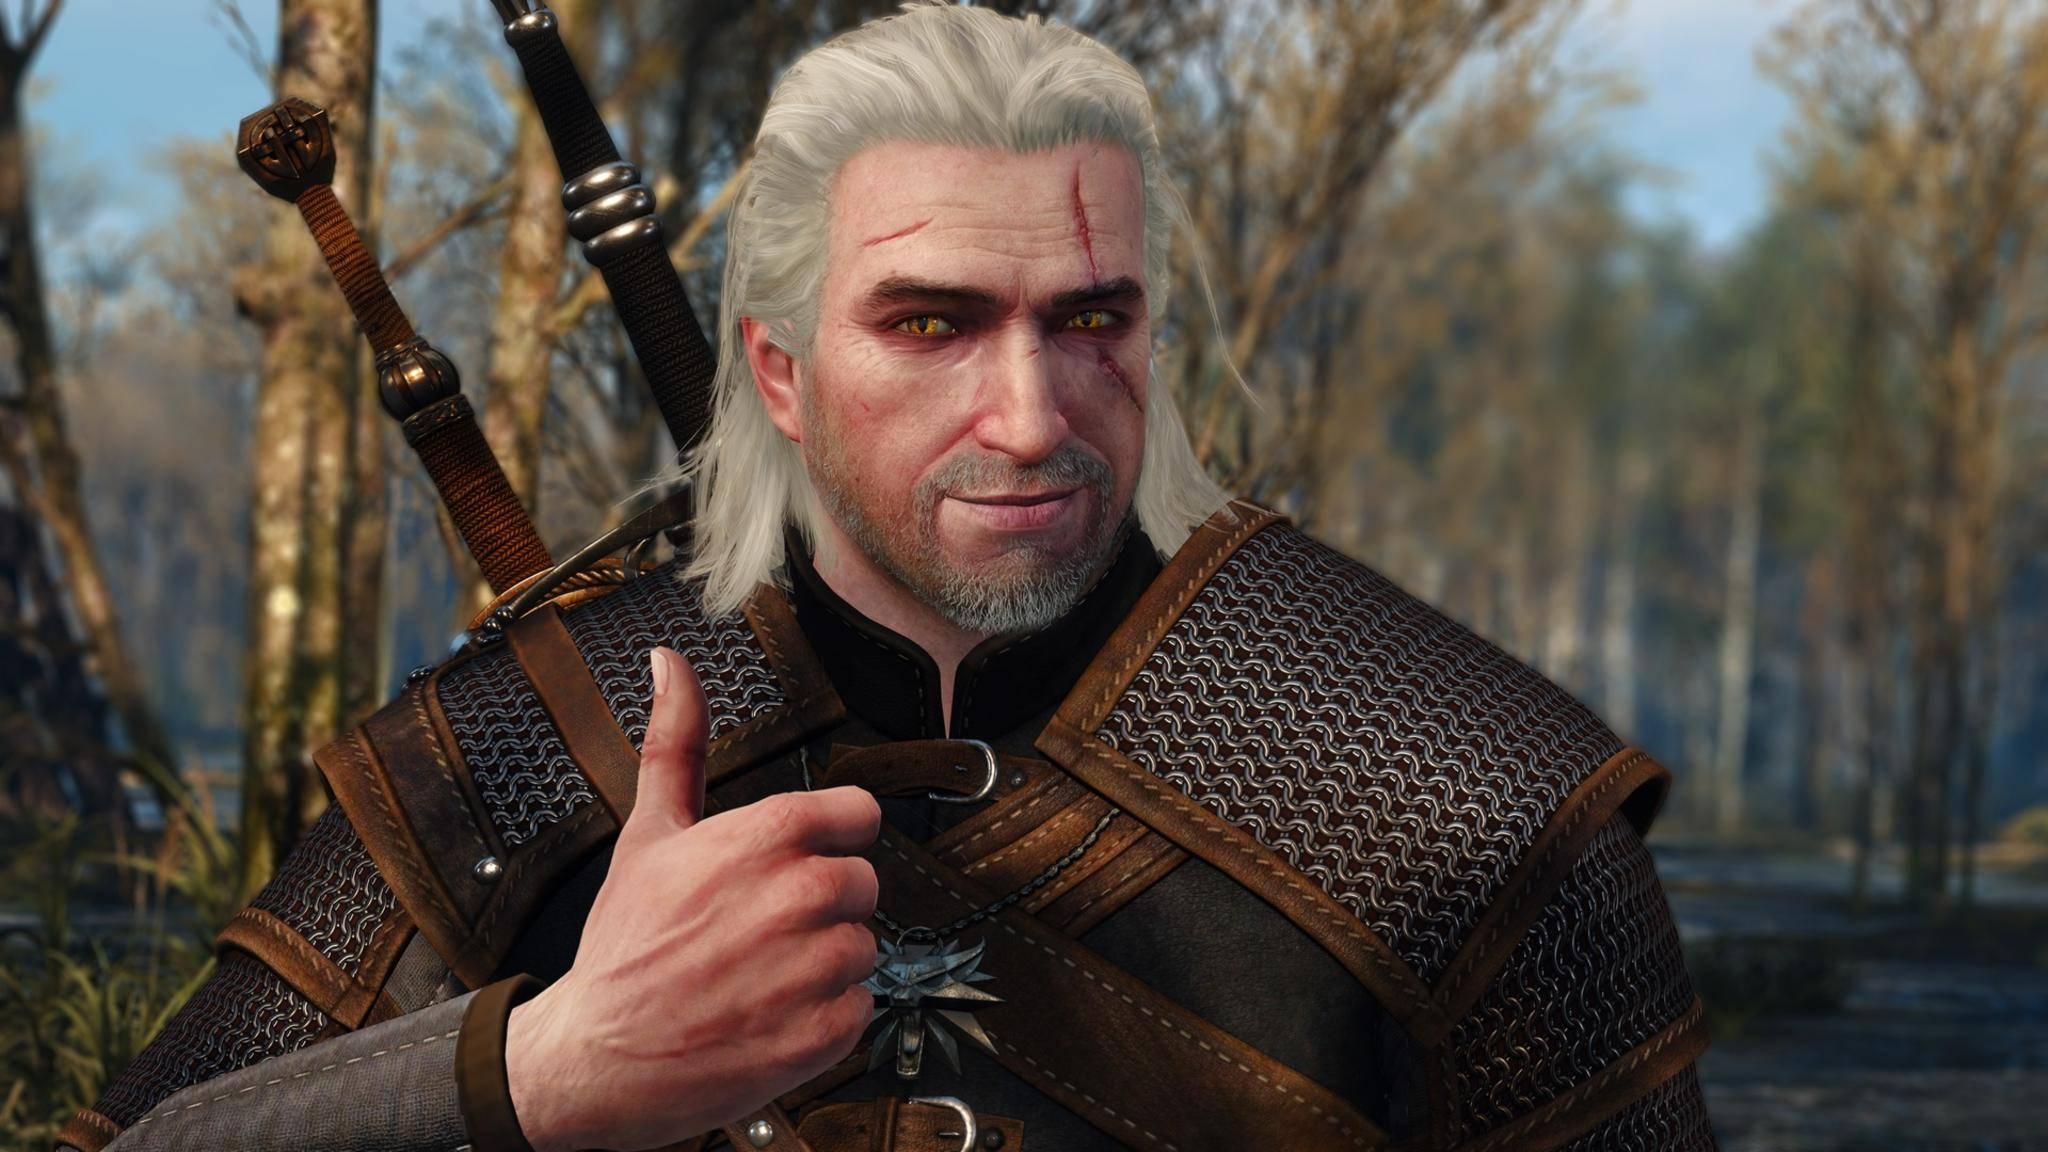 Passt! Henry Cavill wird optisch zum Hexer Geralt von Riva.